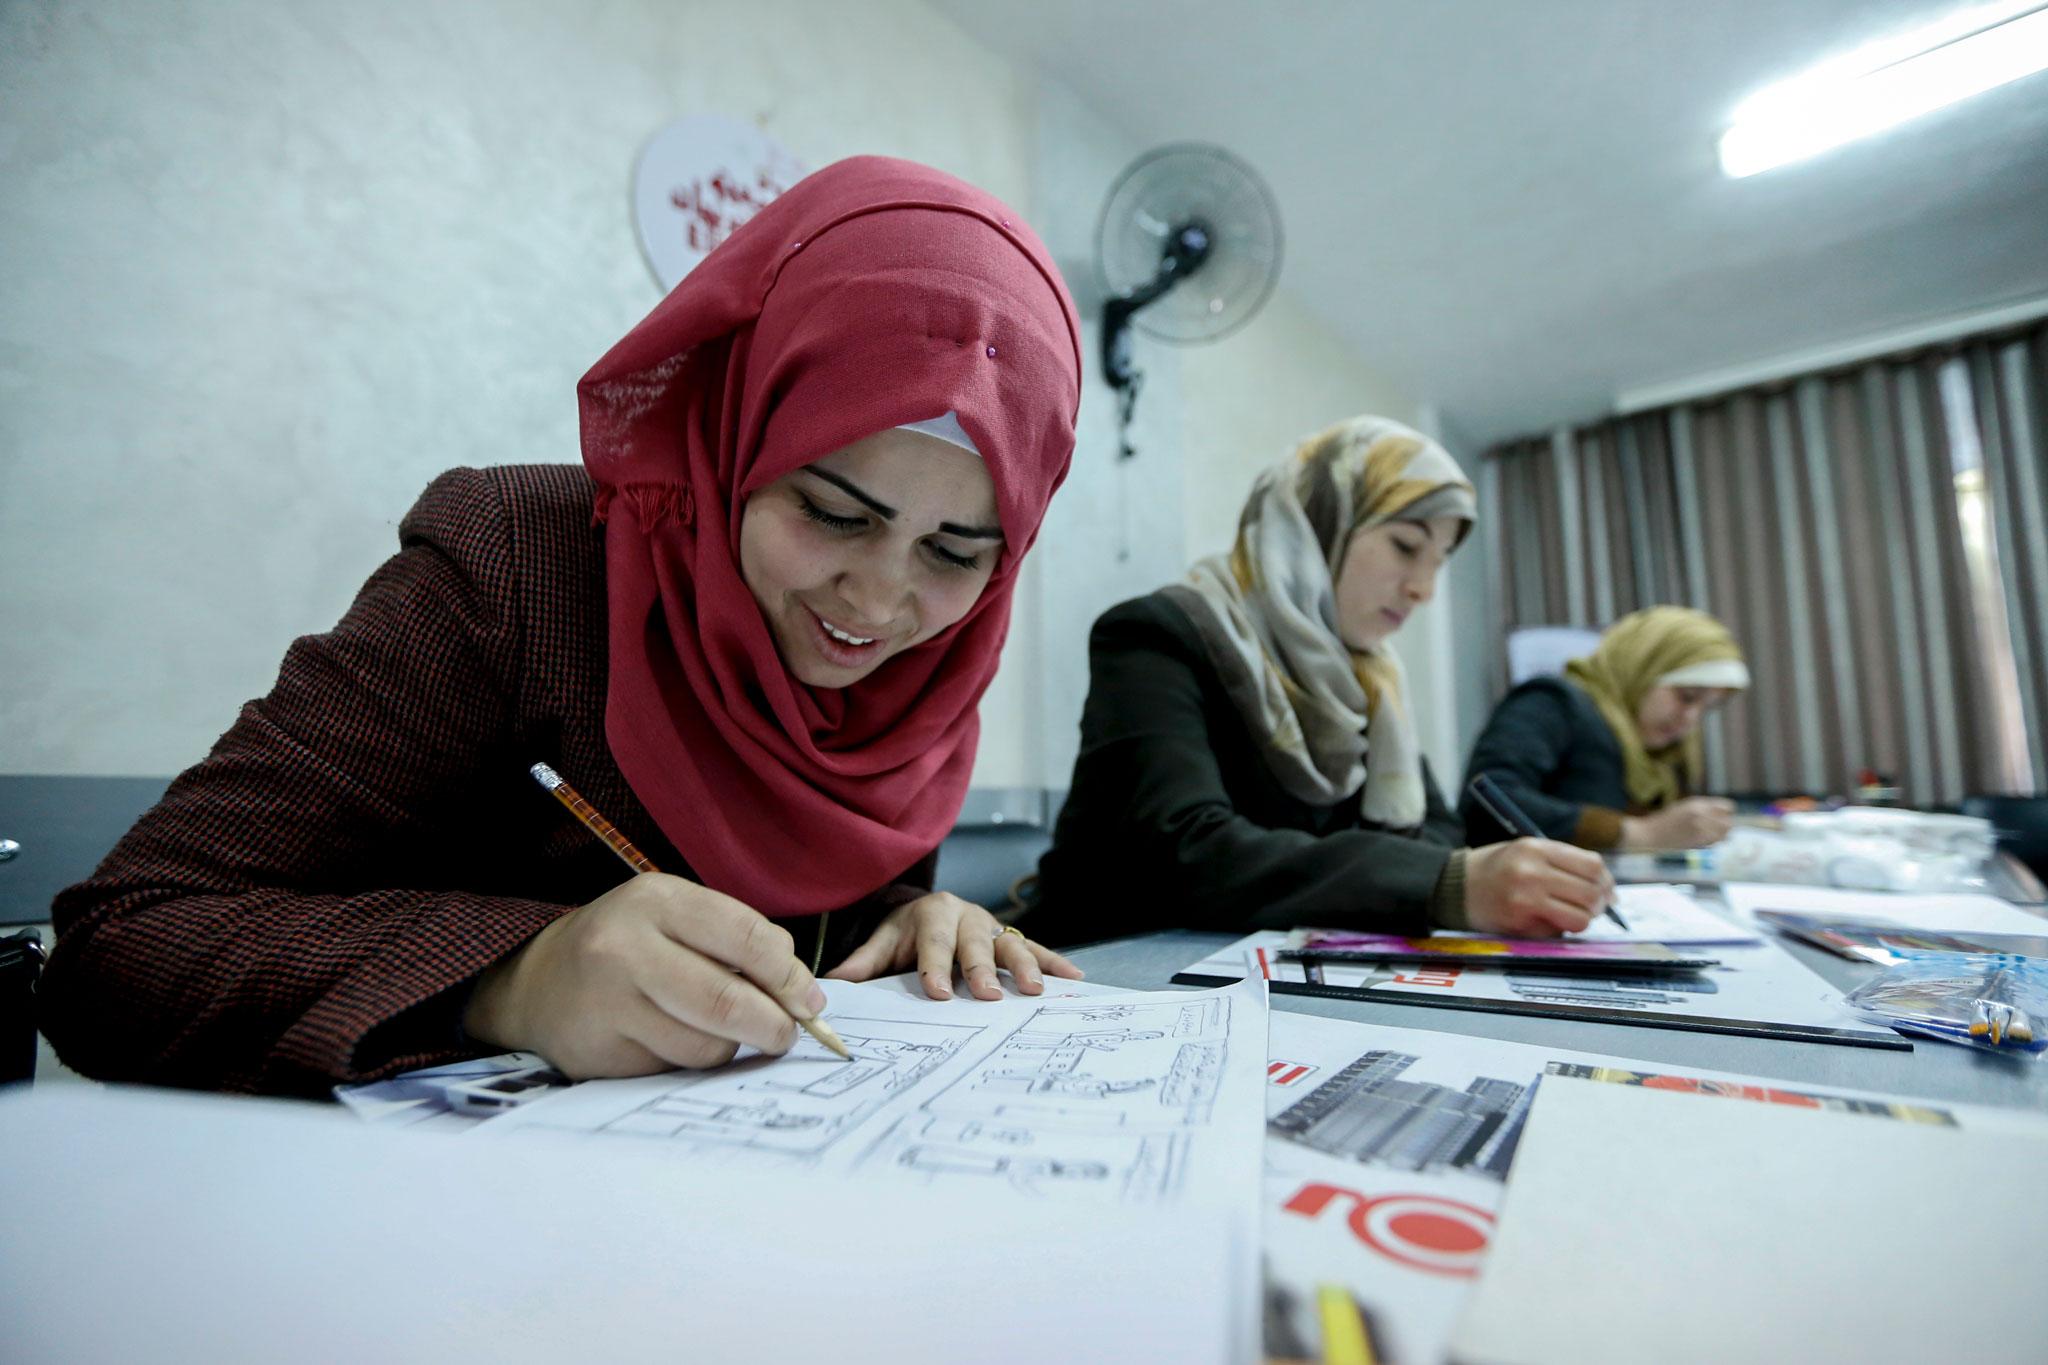 28-year-old Mokaram Al-Hegi (left) during the comic drawing training in Gaza city. © 2017 UNRWA Photo by Rushdi Al-Sarajj